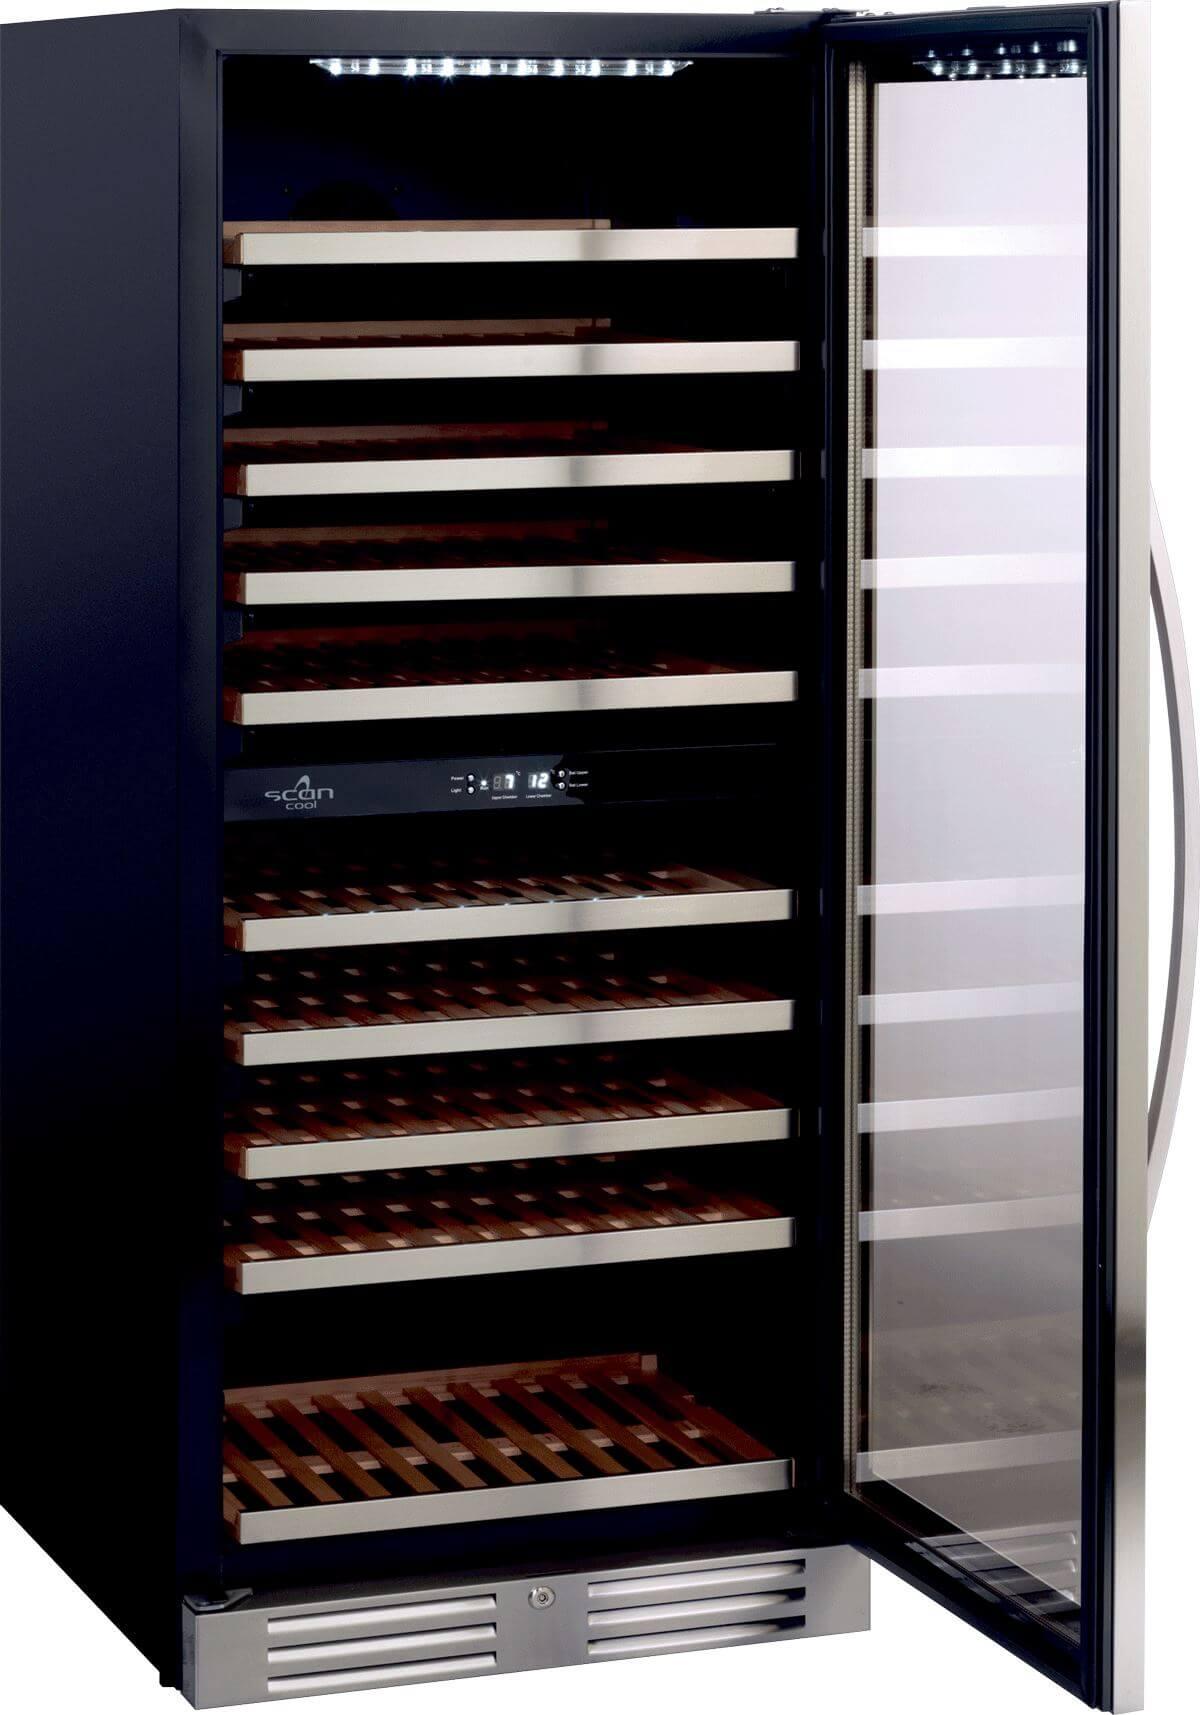 Scandomestic VK 902 vinkøleskab